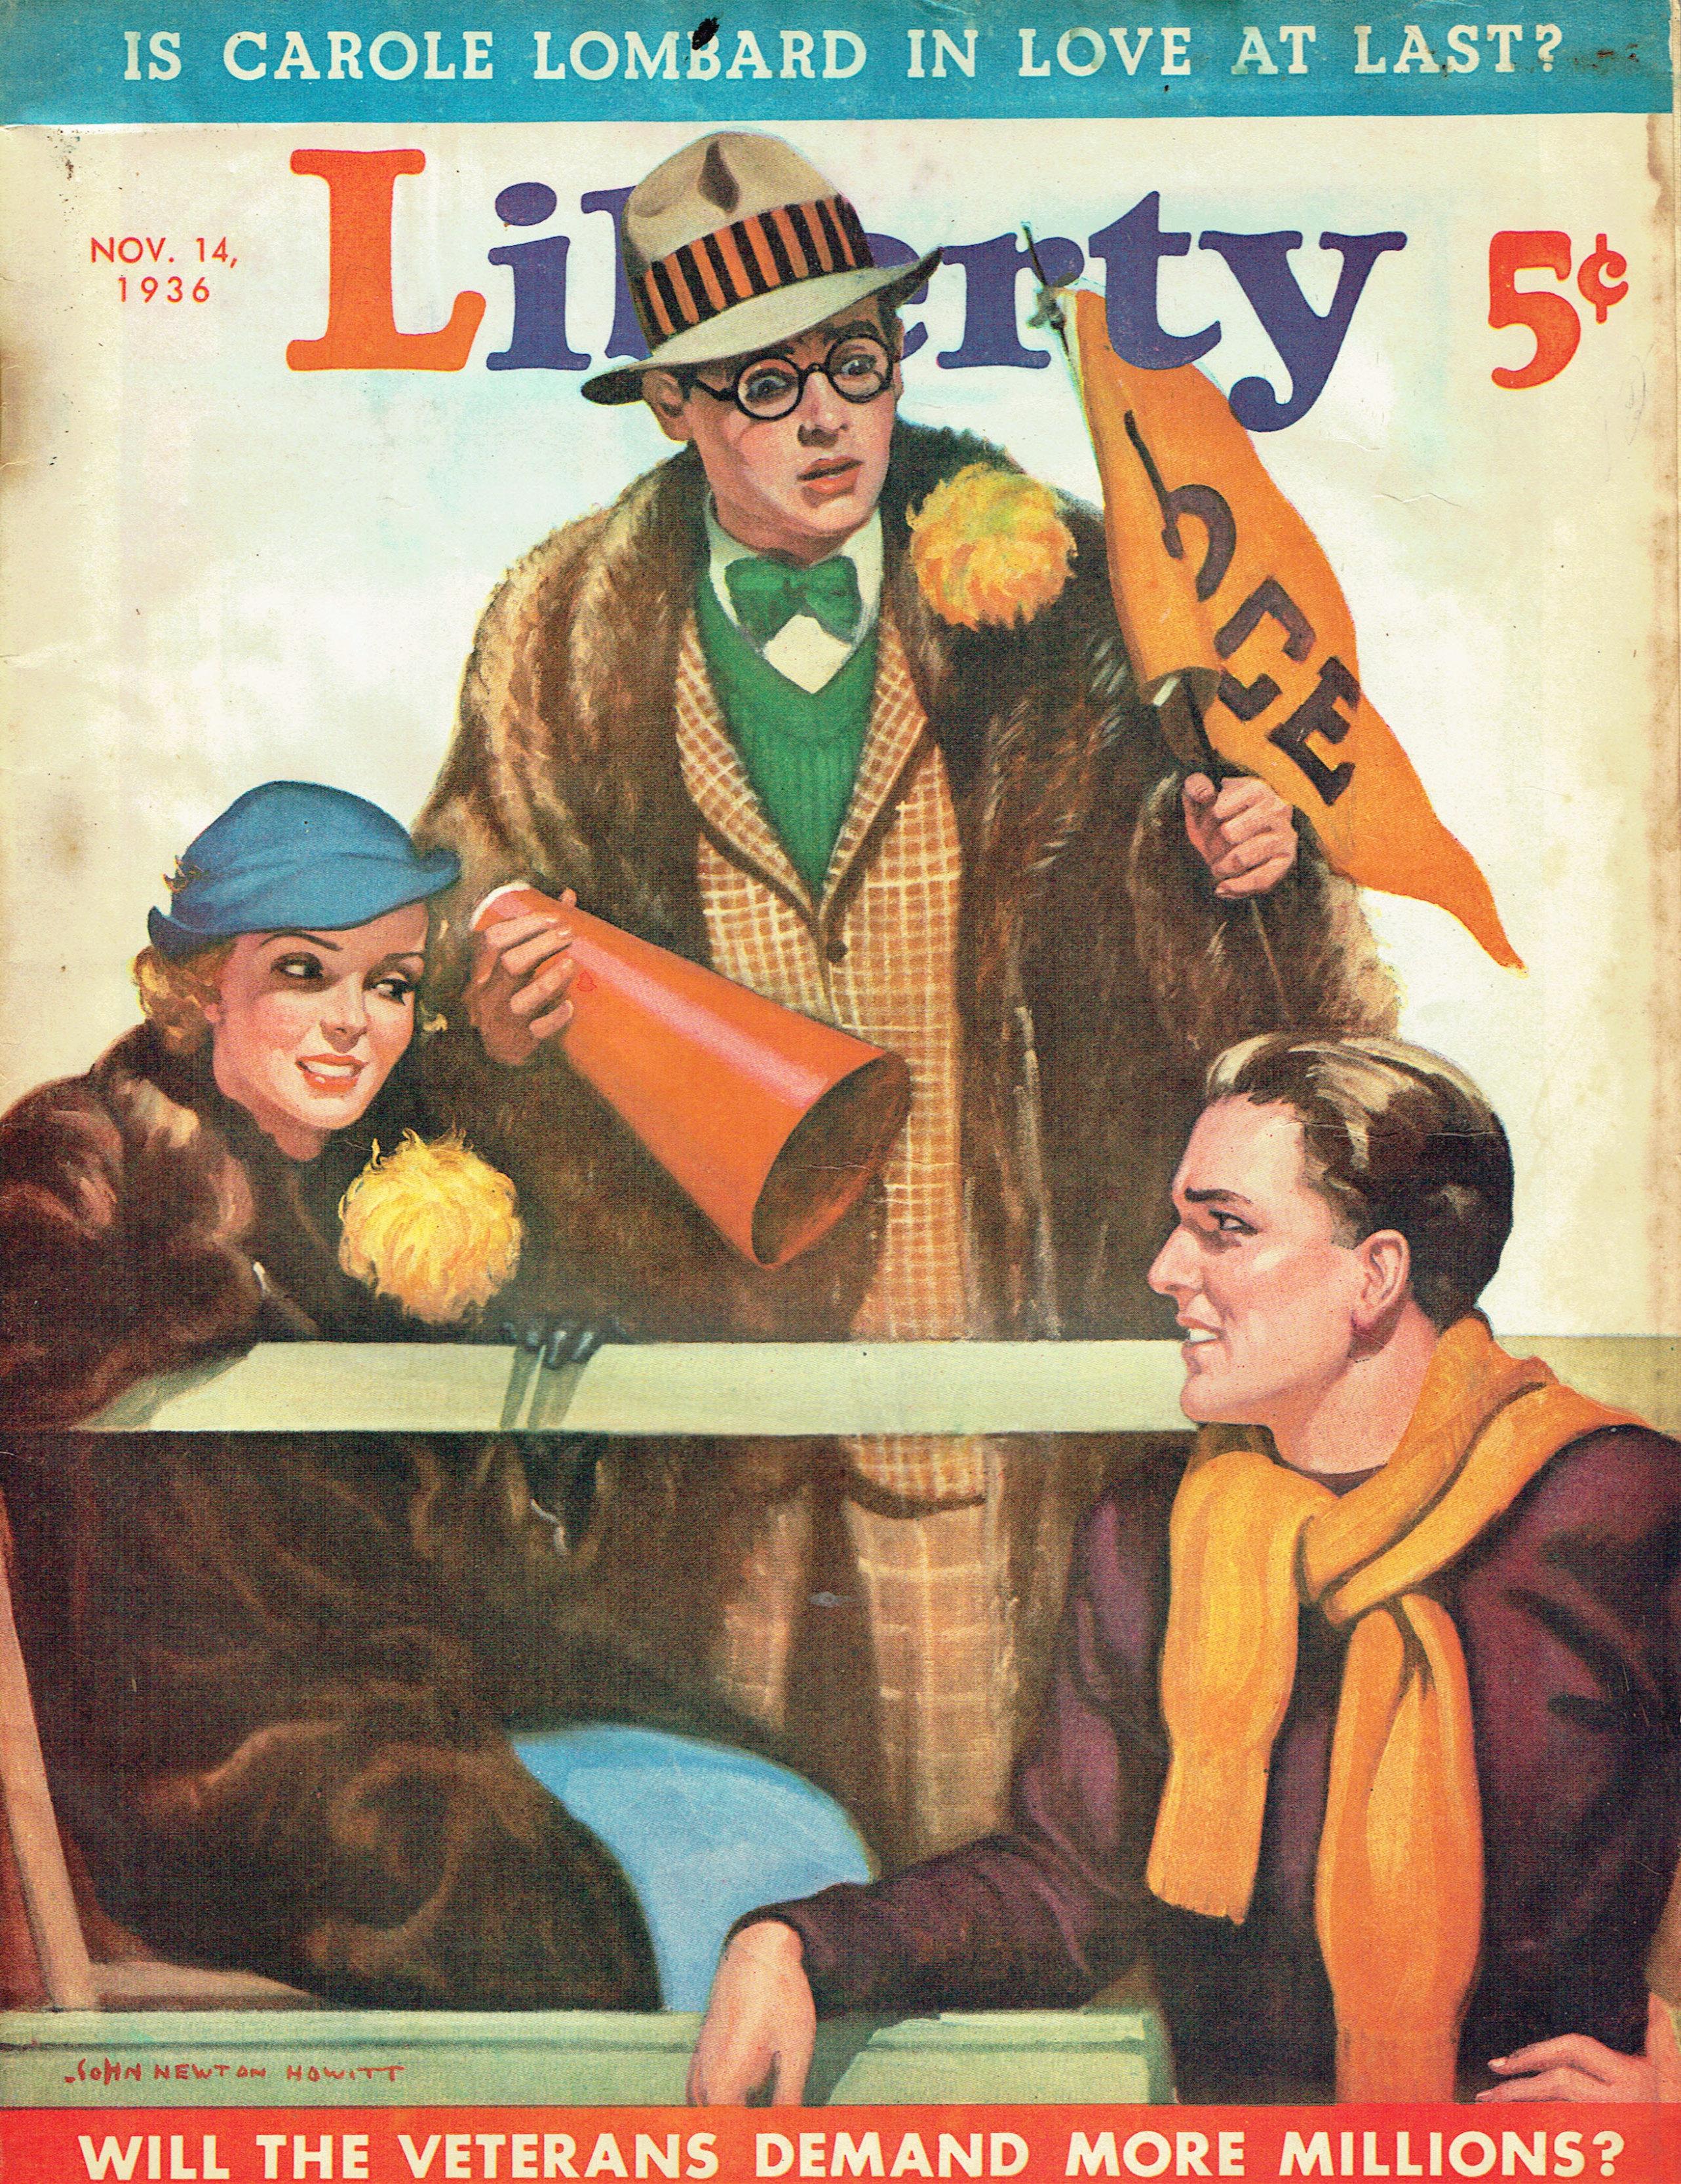 carole lombard liberty 111436 cover